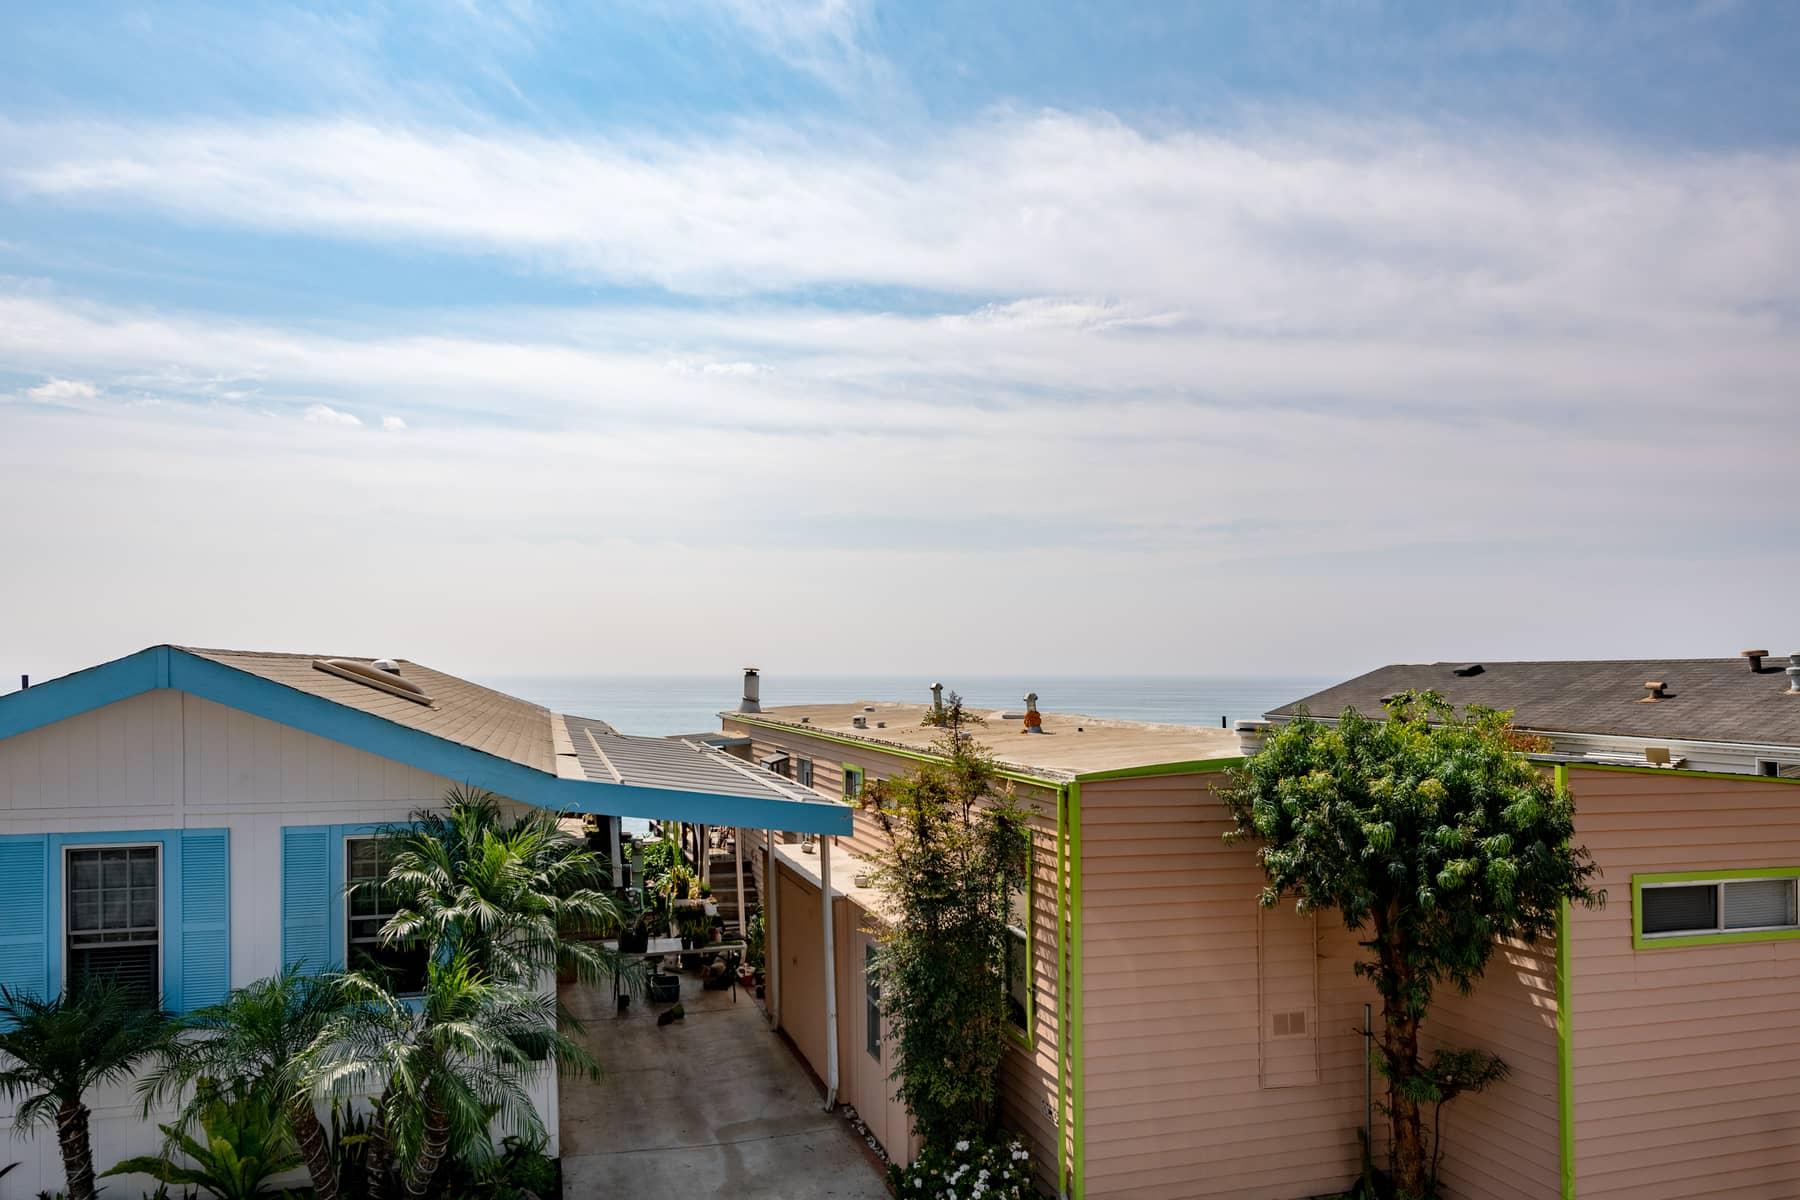 17015 Pacific Coast Highway, Pacific Palisades, California 90272, 2 Bedrooms Bedrooms, ,2 BathroomsBathrooms,Home,For Sale,Pacific Coast Highway,1116